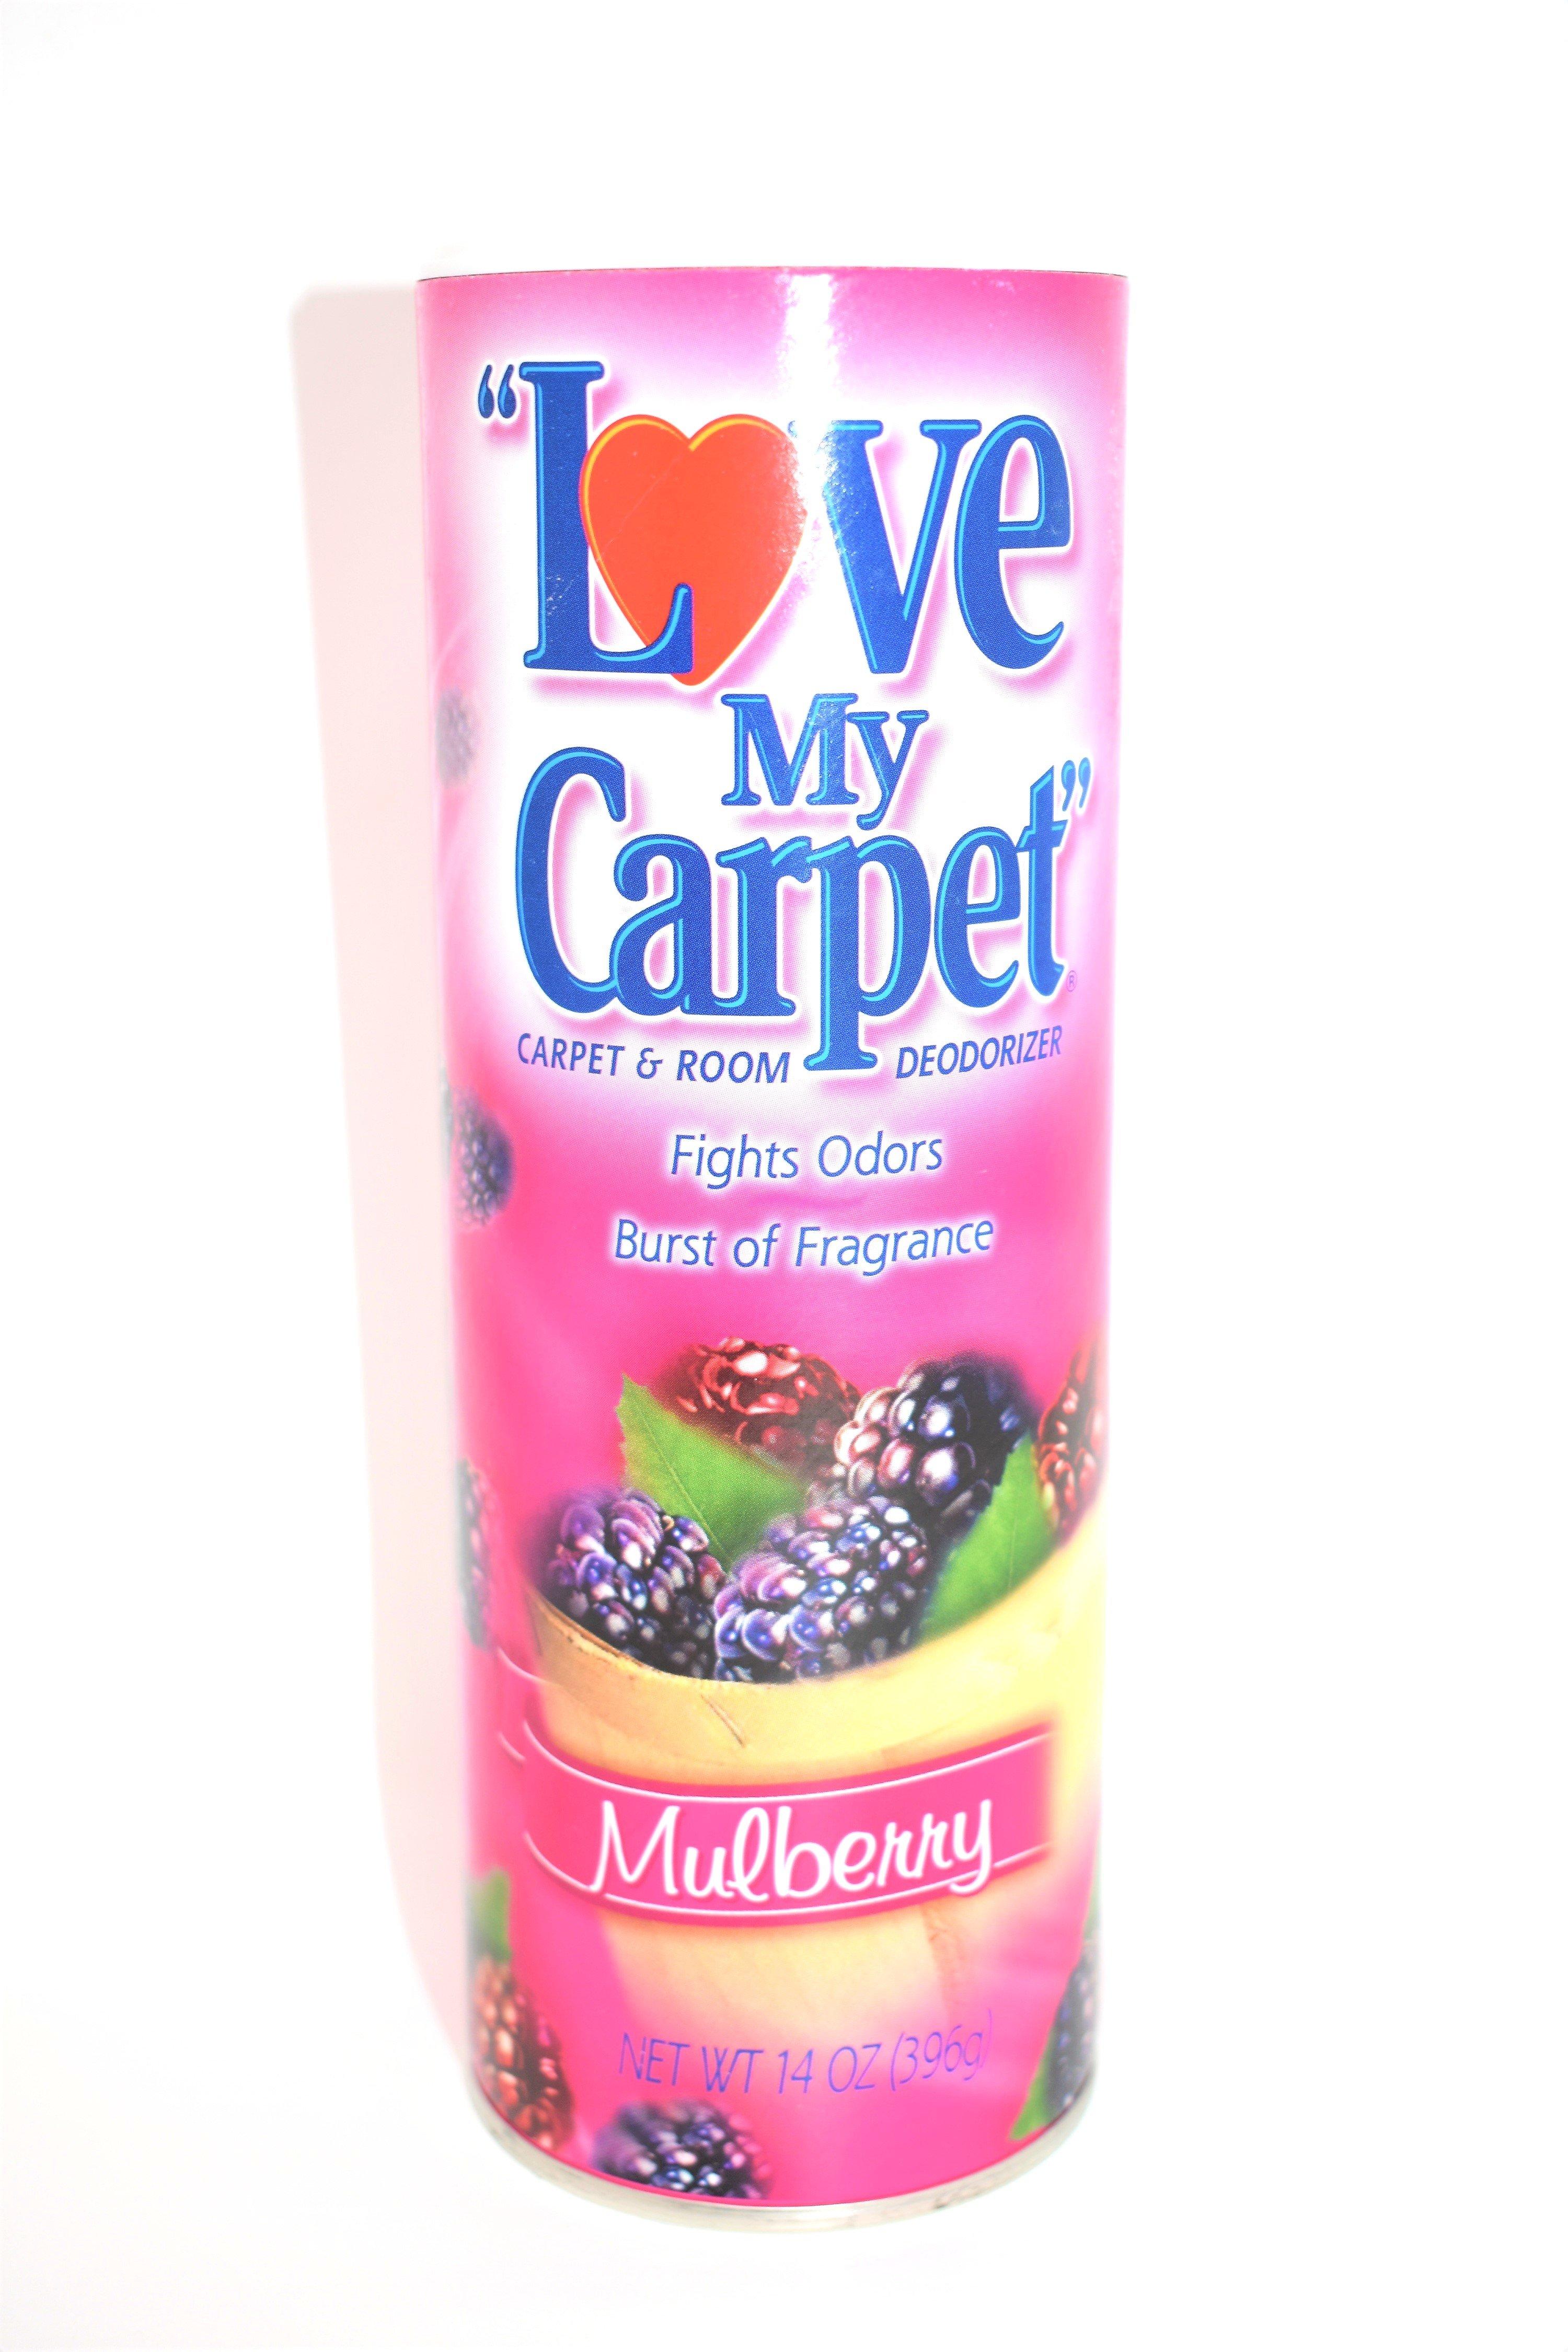 Love My Carpet Mulberry Carpet Room Deodorizer 14 Oz Room Deodorizer Deodorant Clean Scents